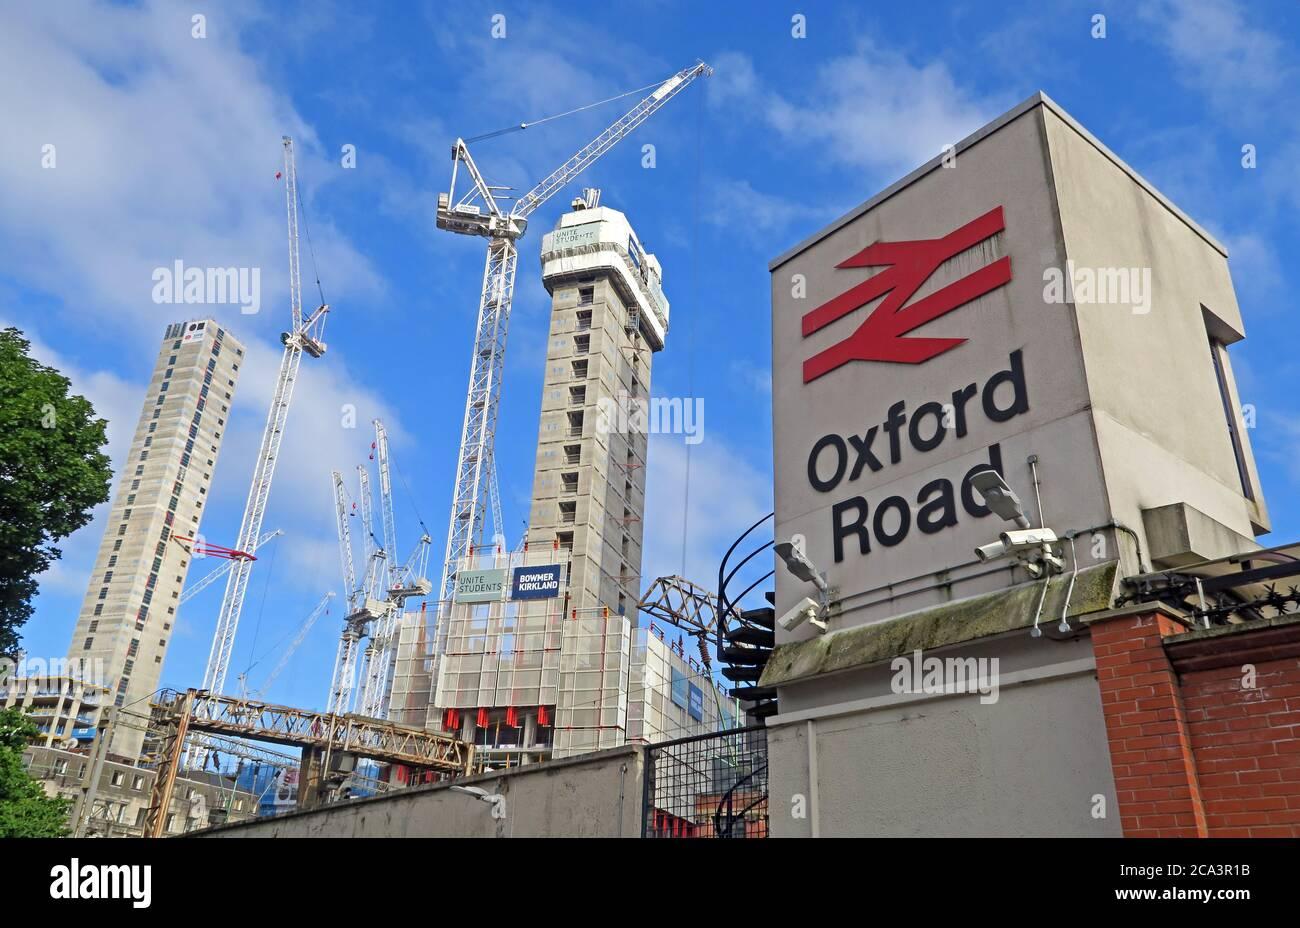 @Hotpixuk,Hotpixuk,GoTonySmith,M1,England,UK,M1 6FU,transport,rail,flats,block,station,Construction of new flats behind,Construction,building,of,new flats,behind,near,MCO,railtrack,Network rail,BR sign,BR,sign,crane,building site,site,Unite Students,Bowmer Kirkland,builder,builders